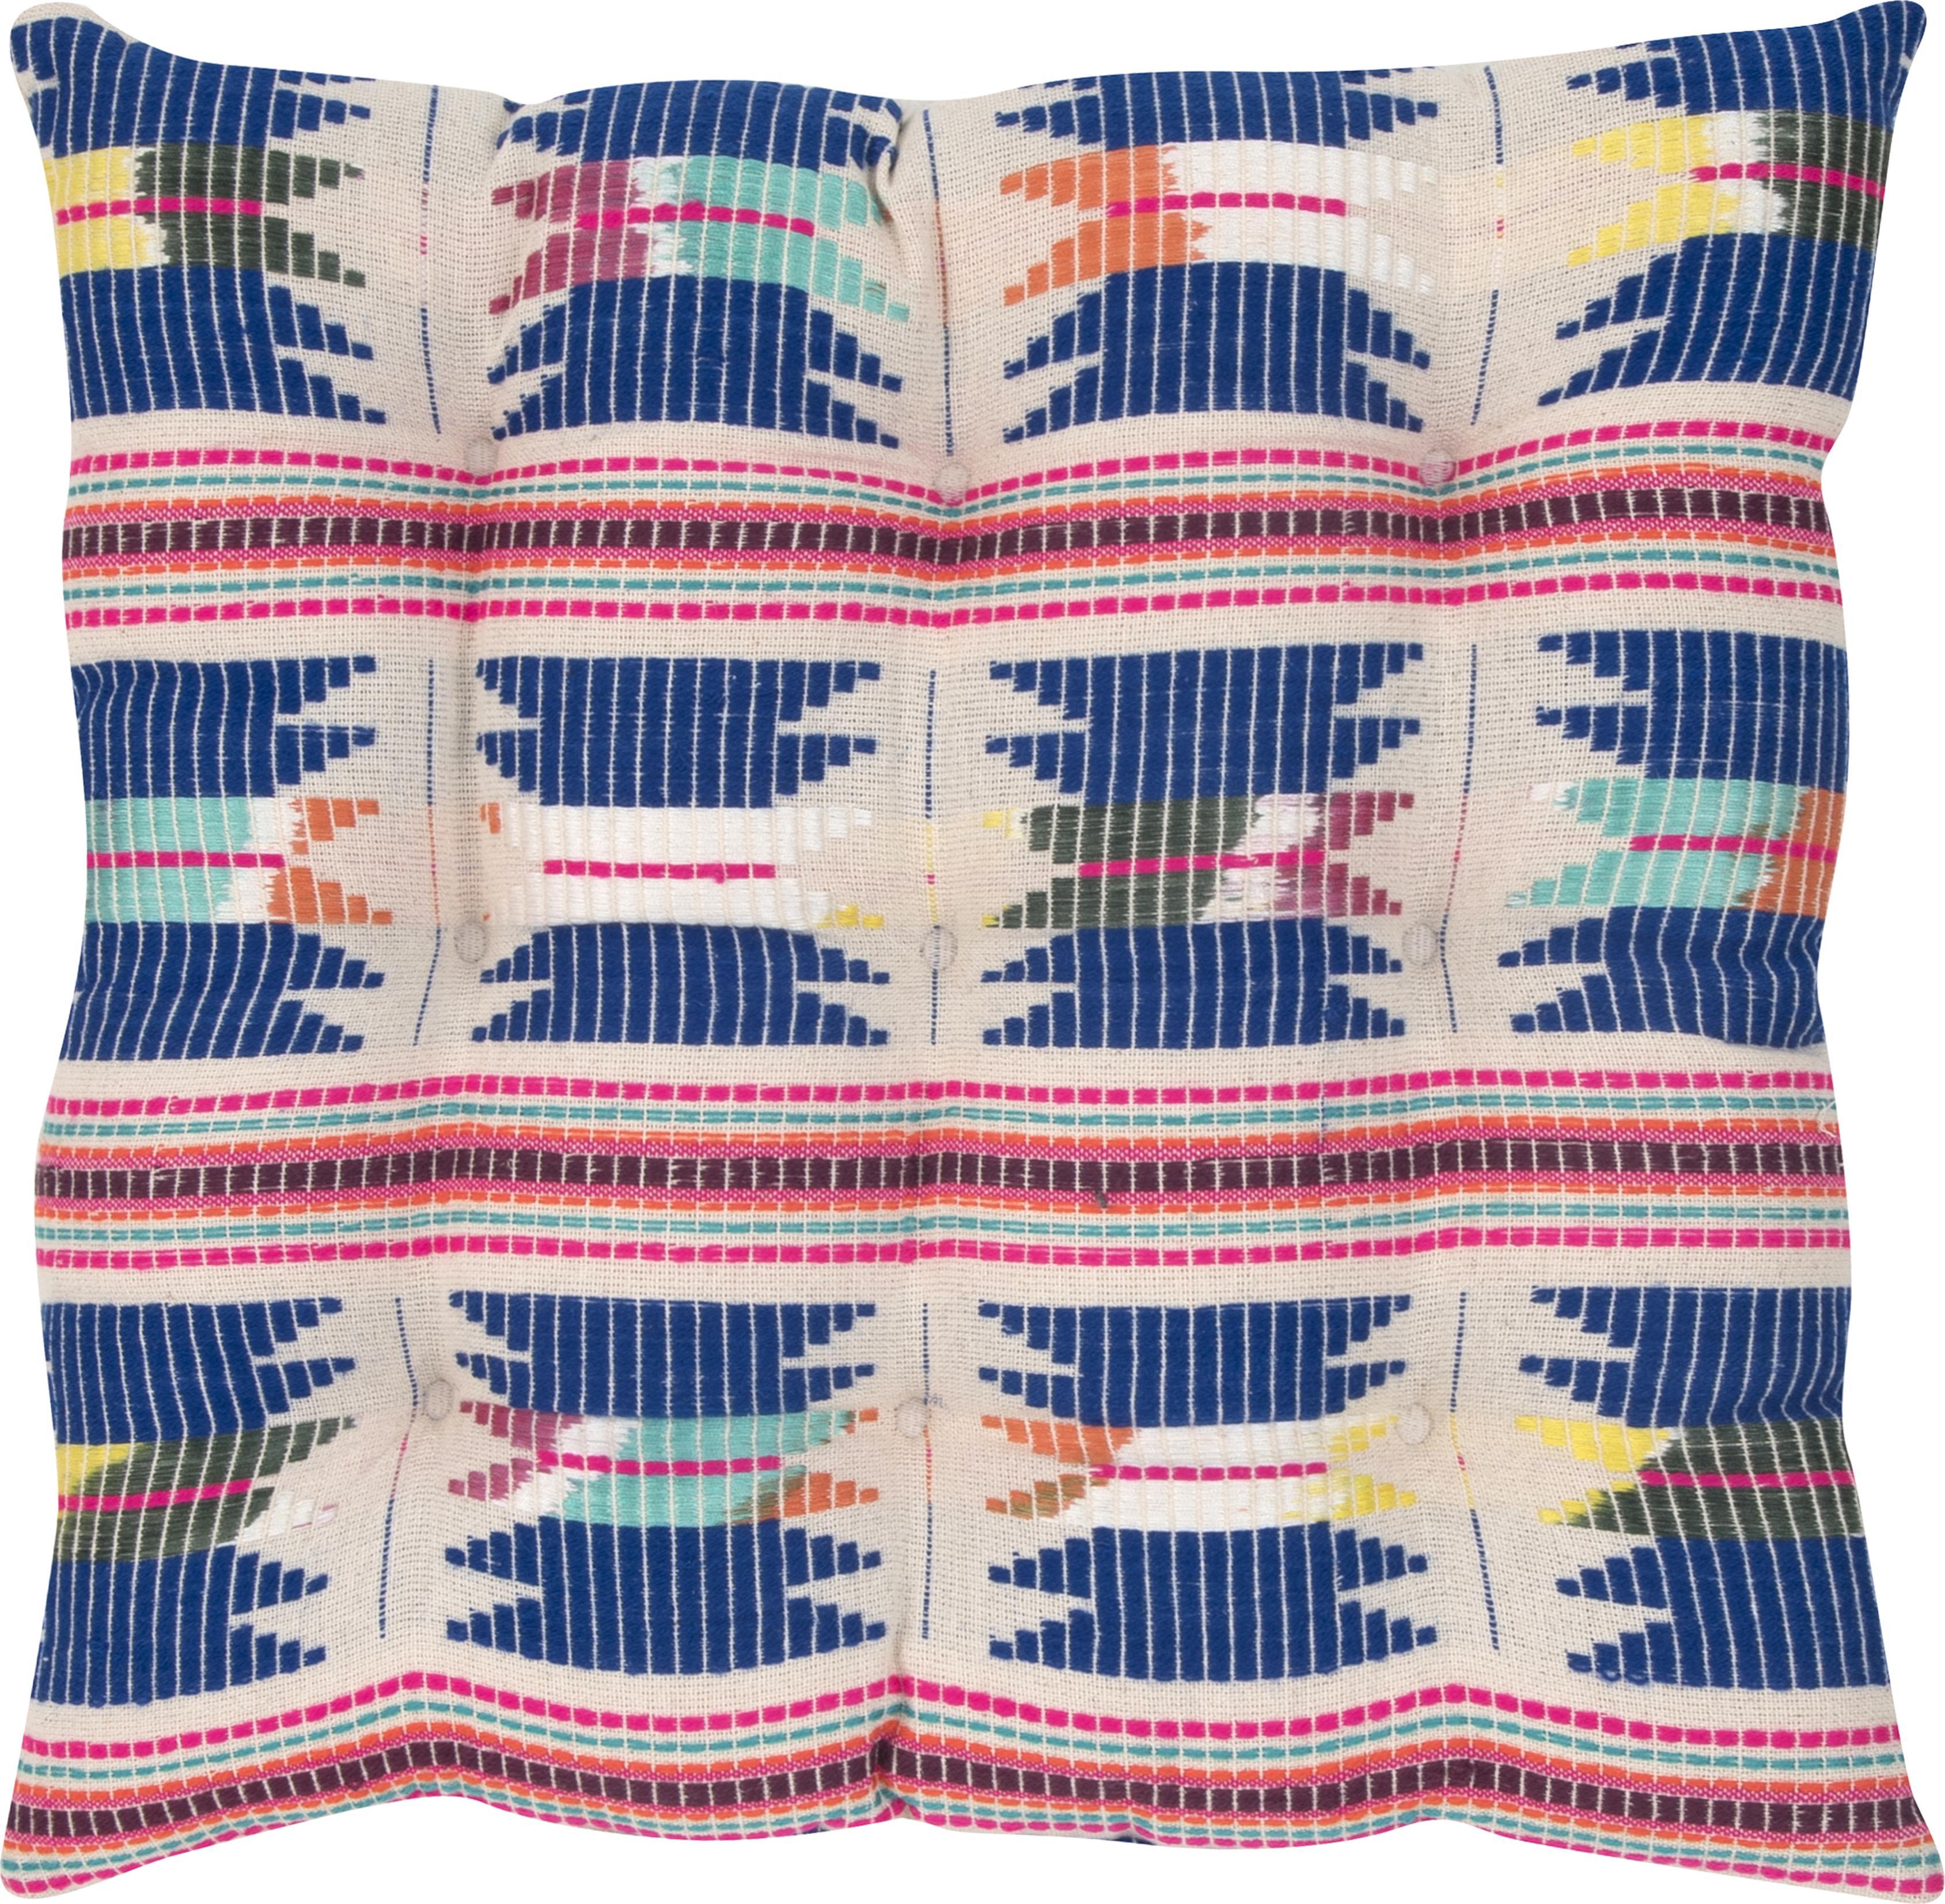 Cuscino sedia ricamato Maria, Fronte: multicolore Retro: beige, Larg. 40 x Lung. 40 cm